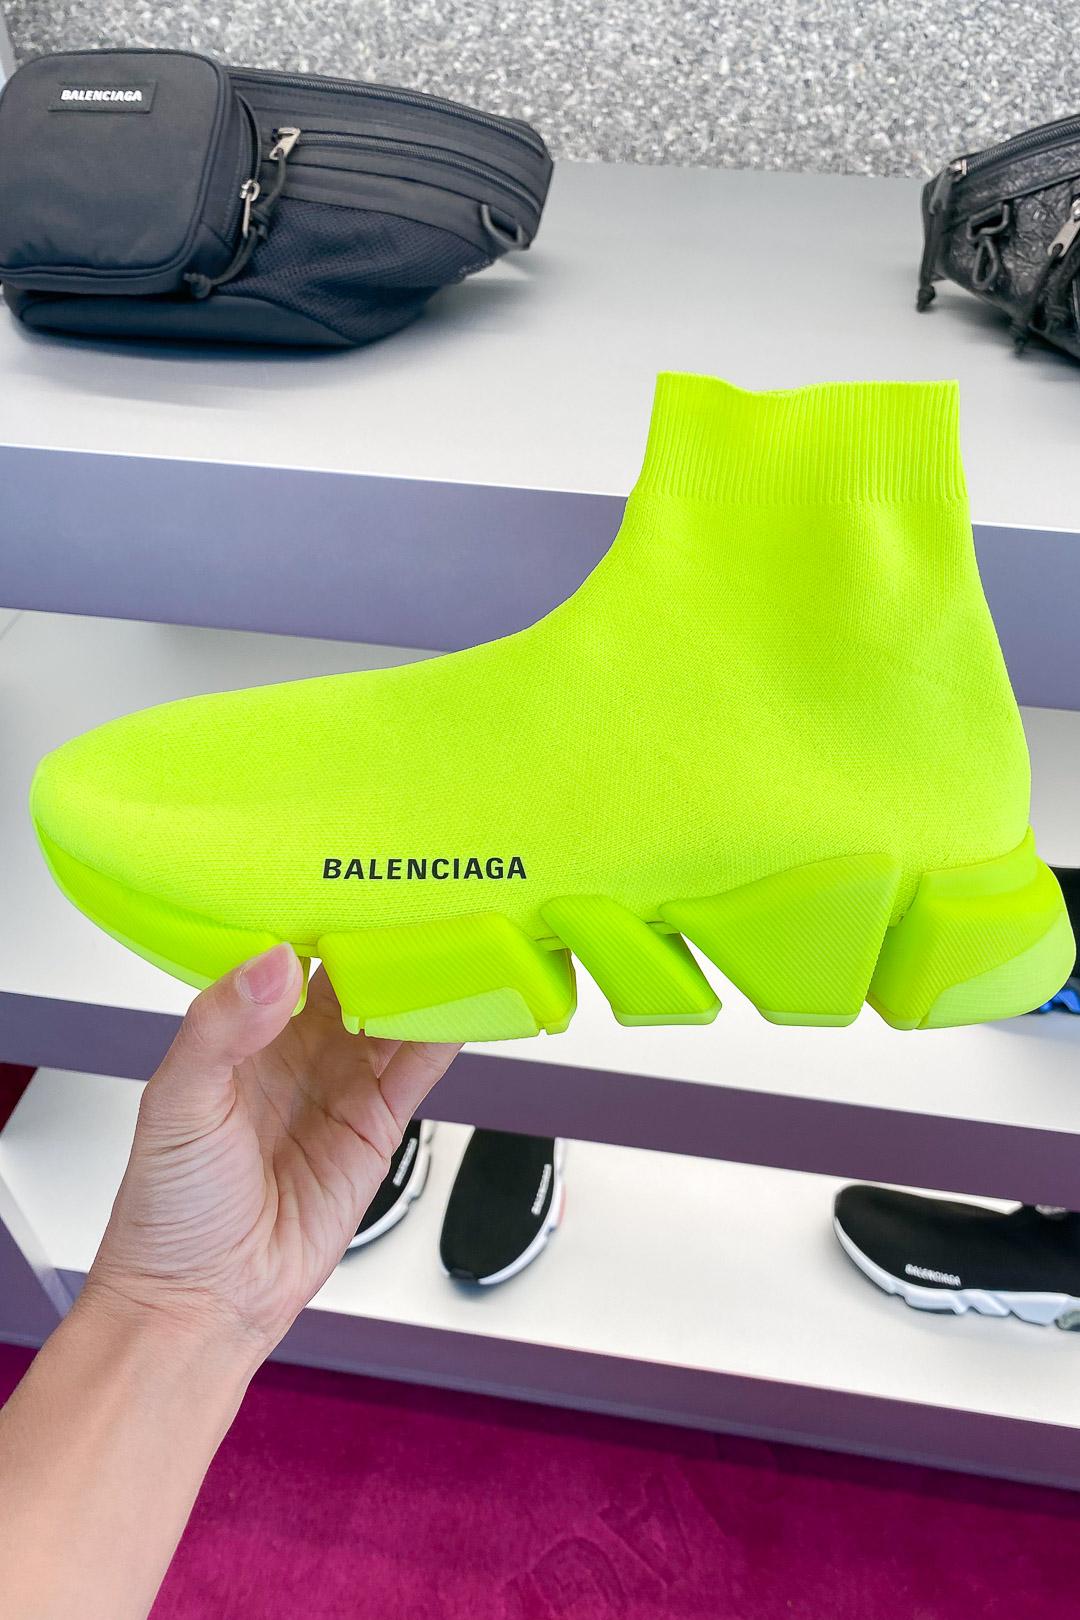 Balenciaga Men's Speed 2.0 Sneaker in Yellow